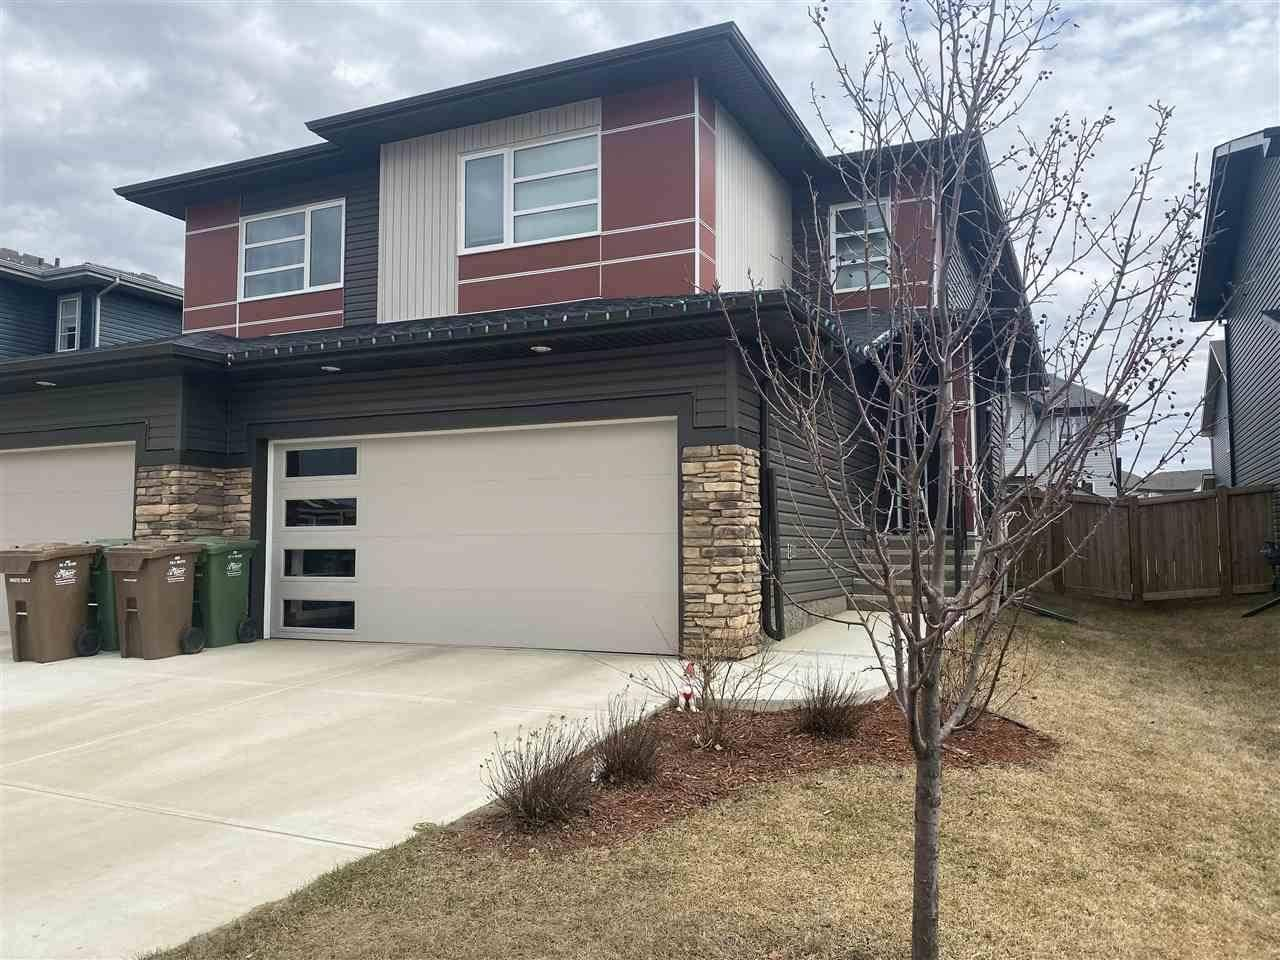 Townhouse for sale at 37 Roberge Cs St. Albert Alberta - MLS: E4192070